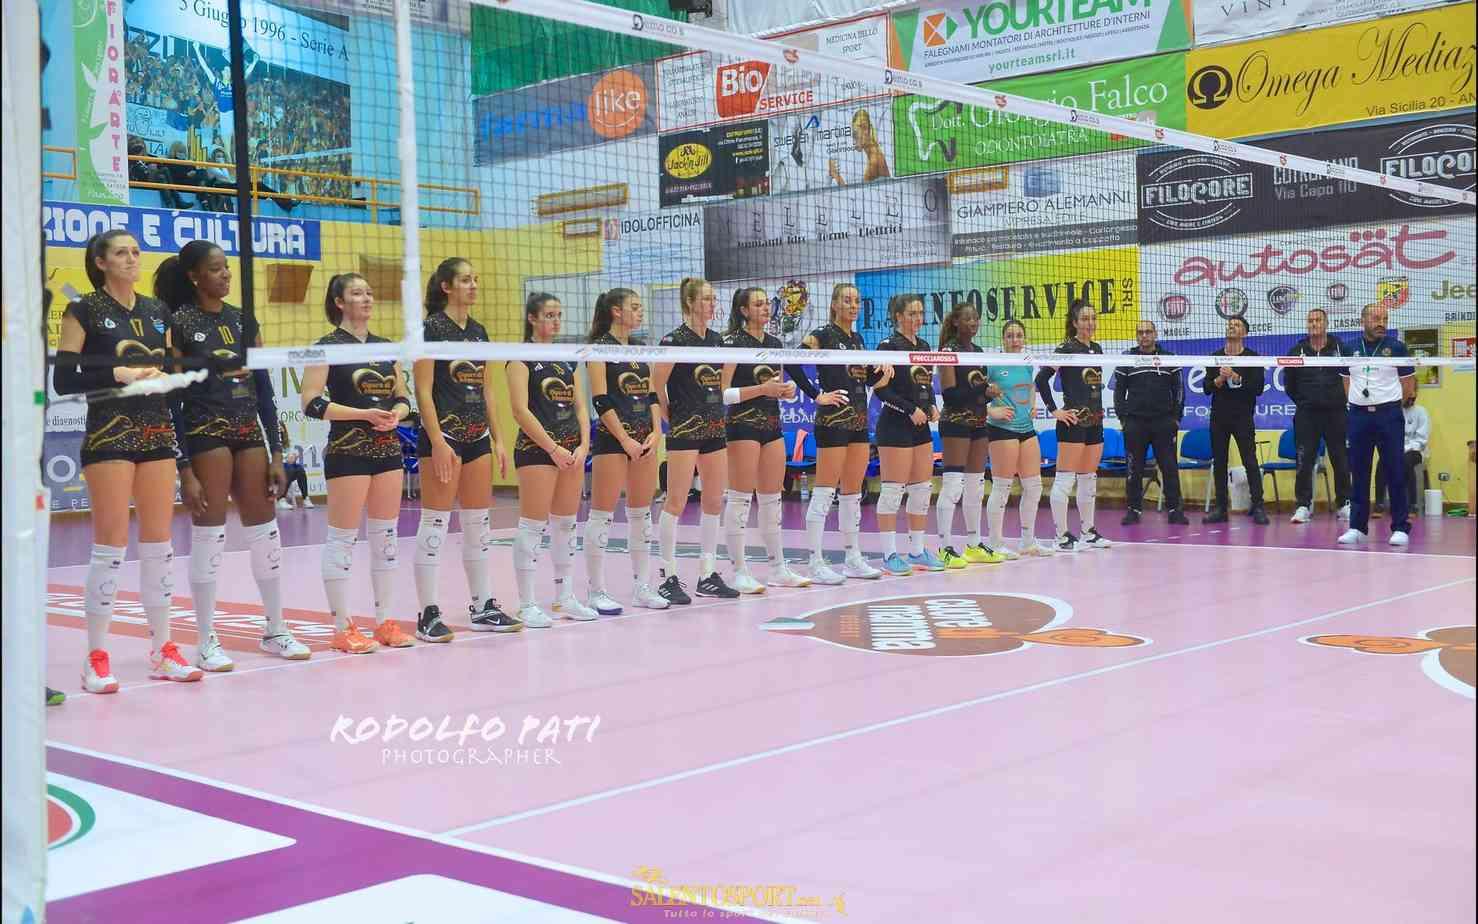 volley-cutrofiano-dic-20-rodolfo-pati